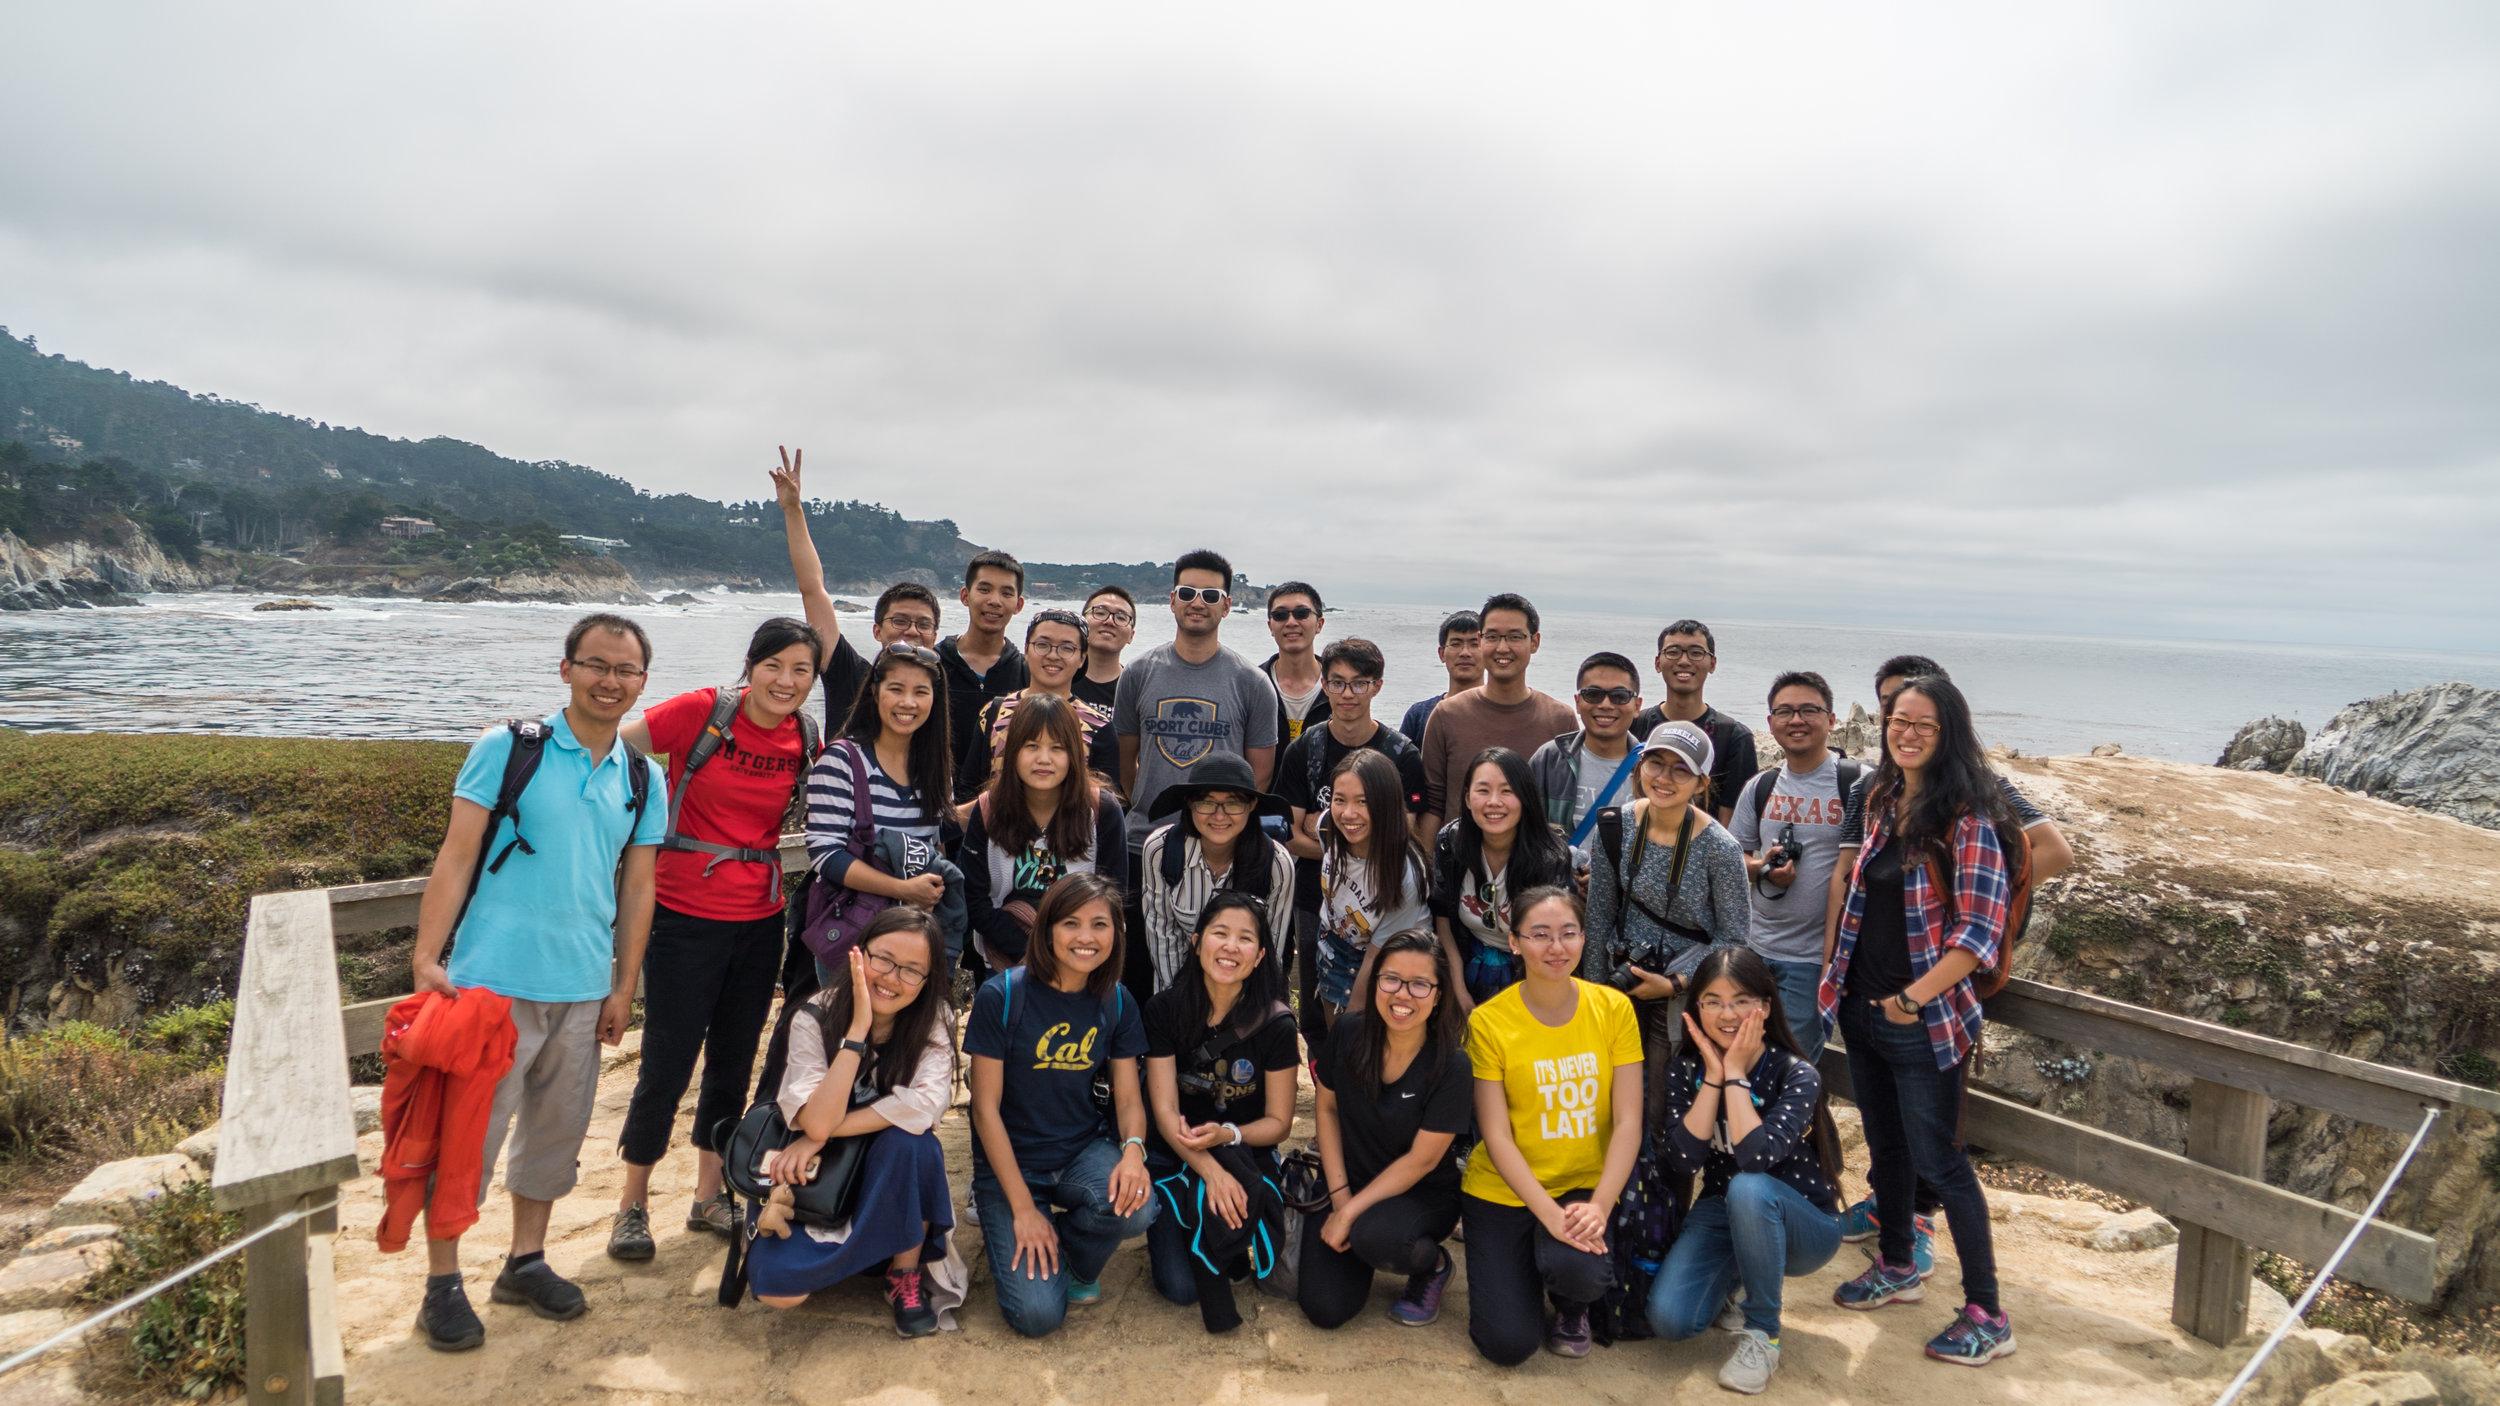 2017-09-09_IGSM_Monterey_Trip_DSC06887.jpg